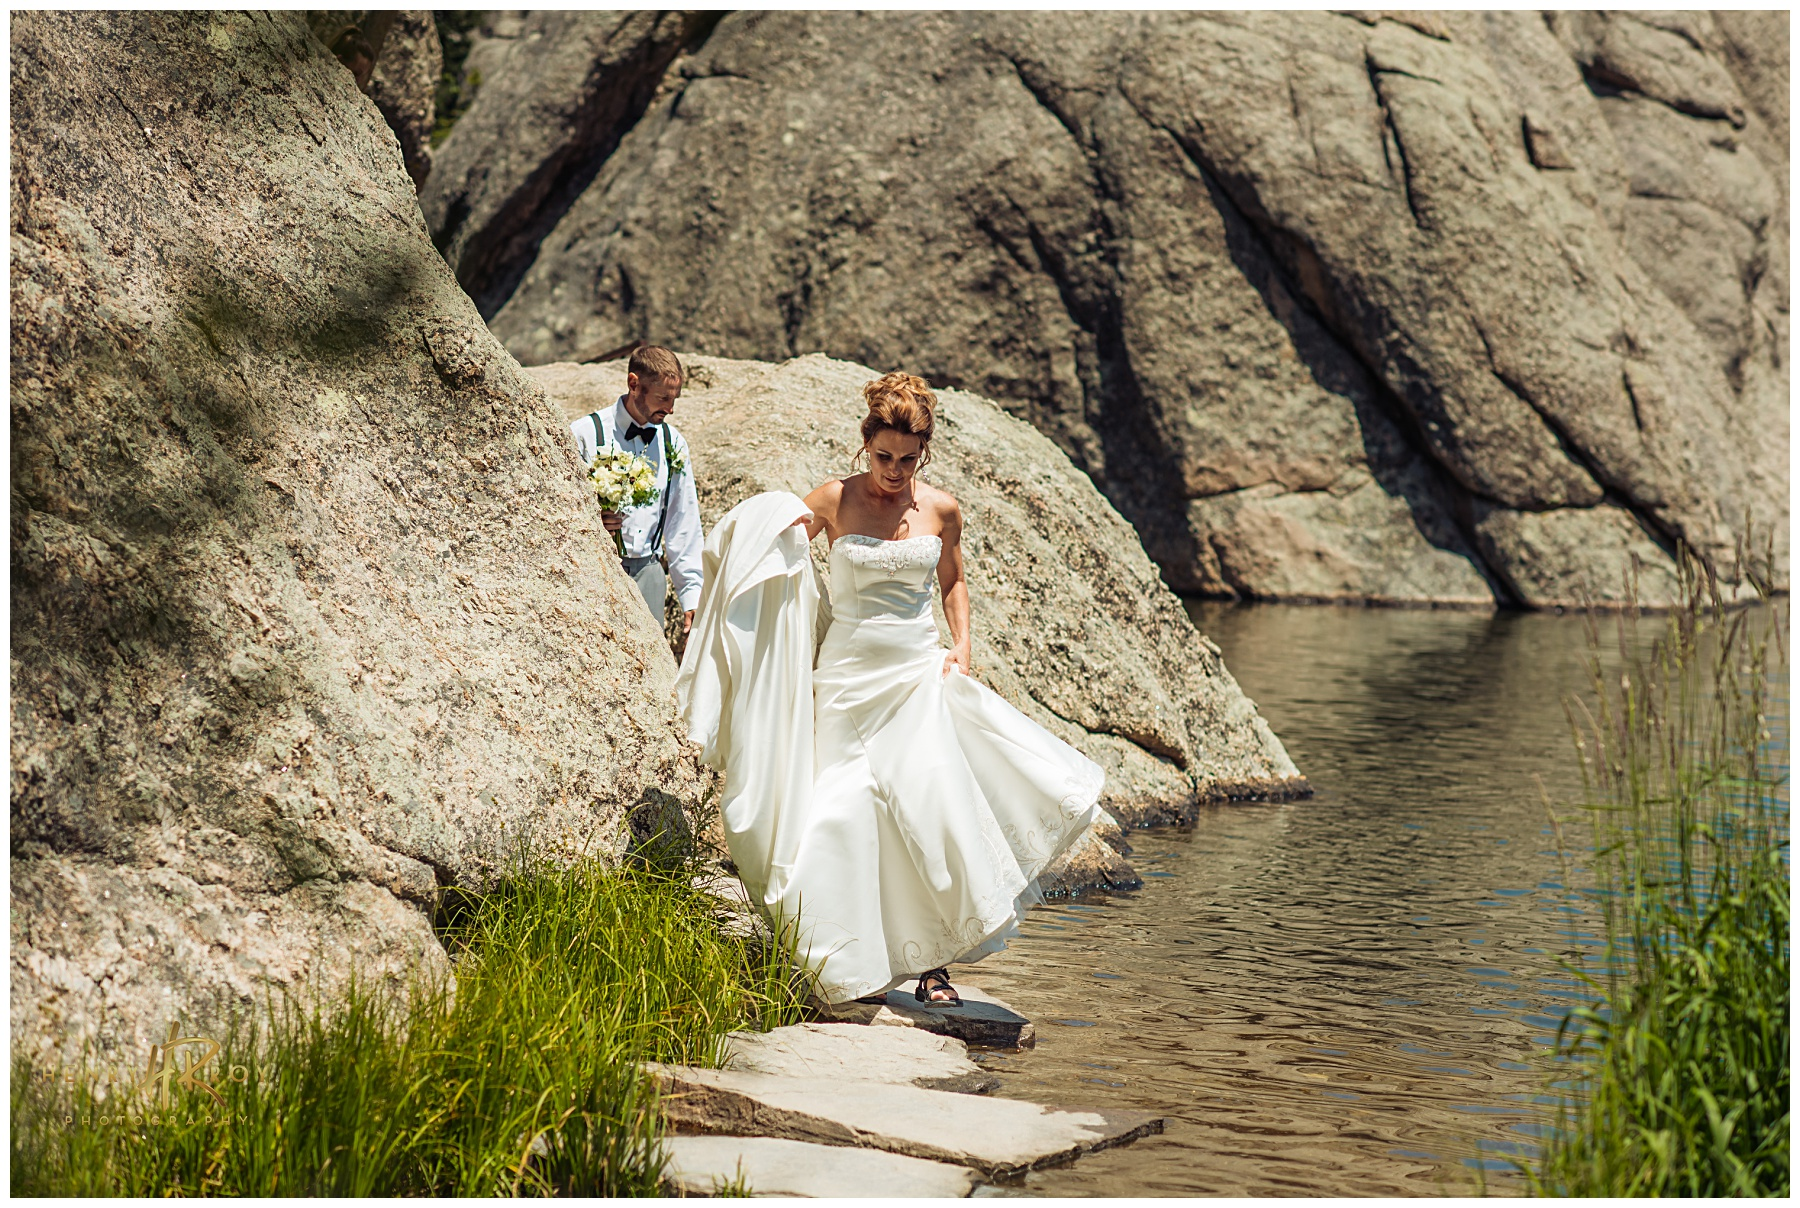 Wedding Photographer028.jpg